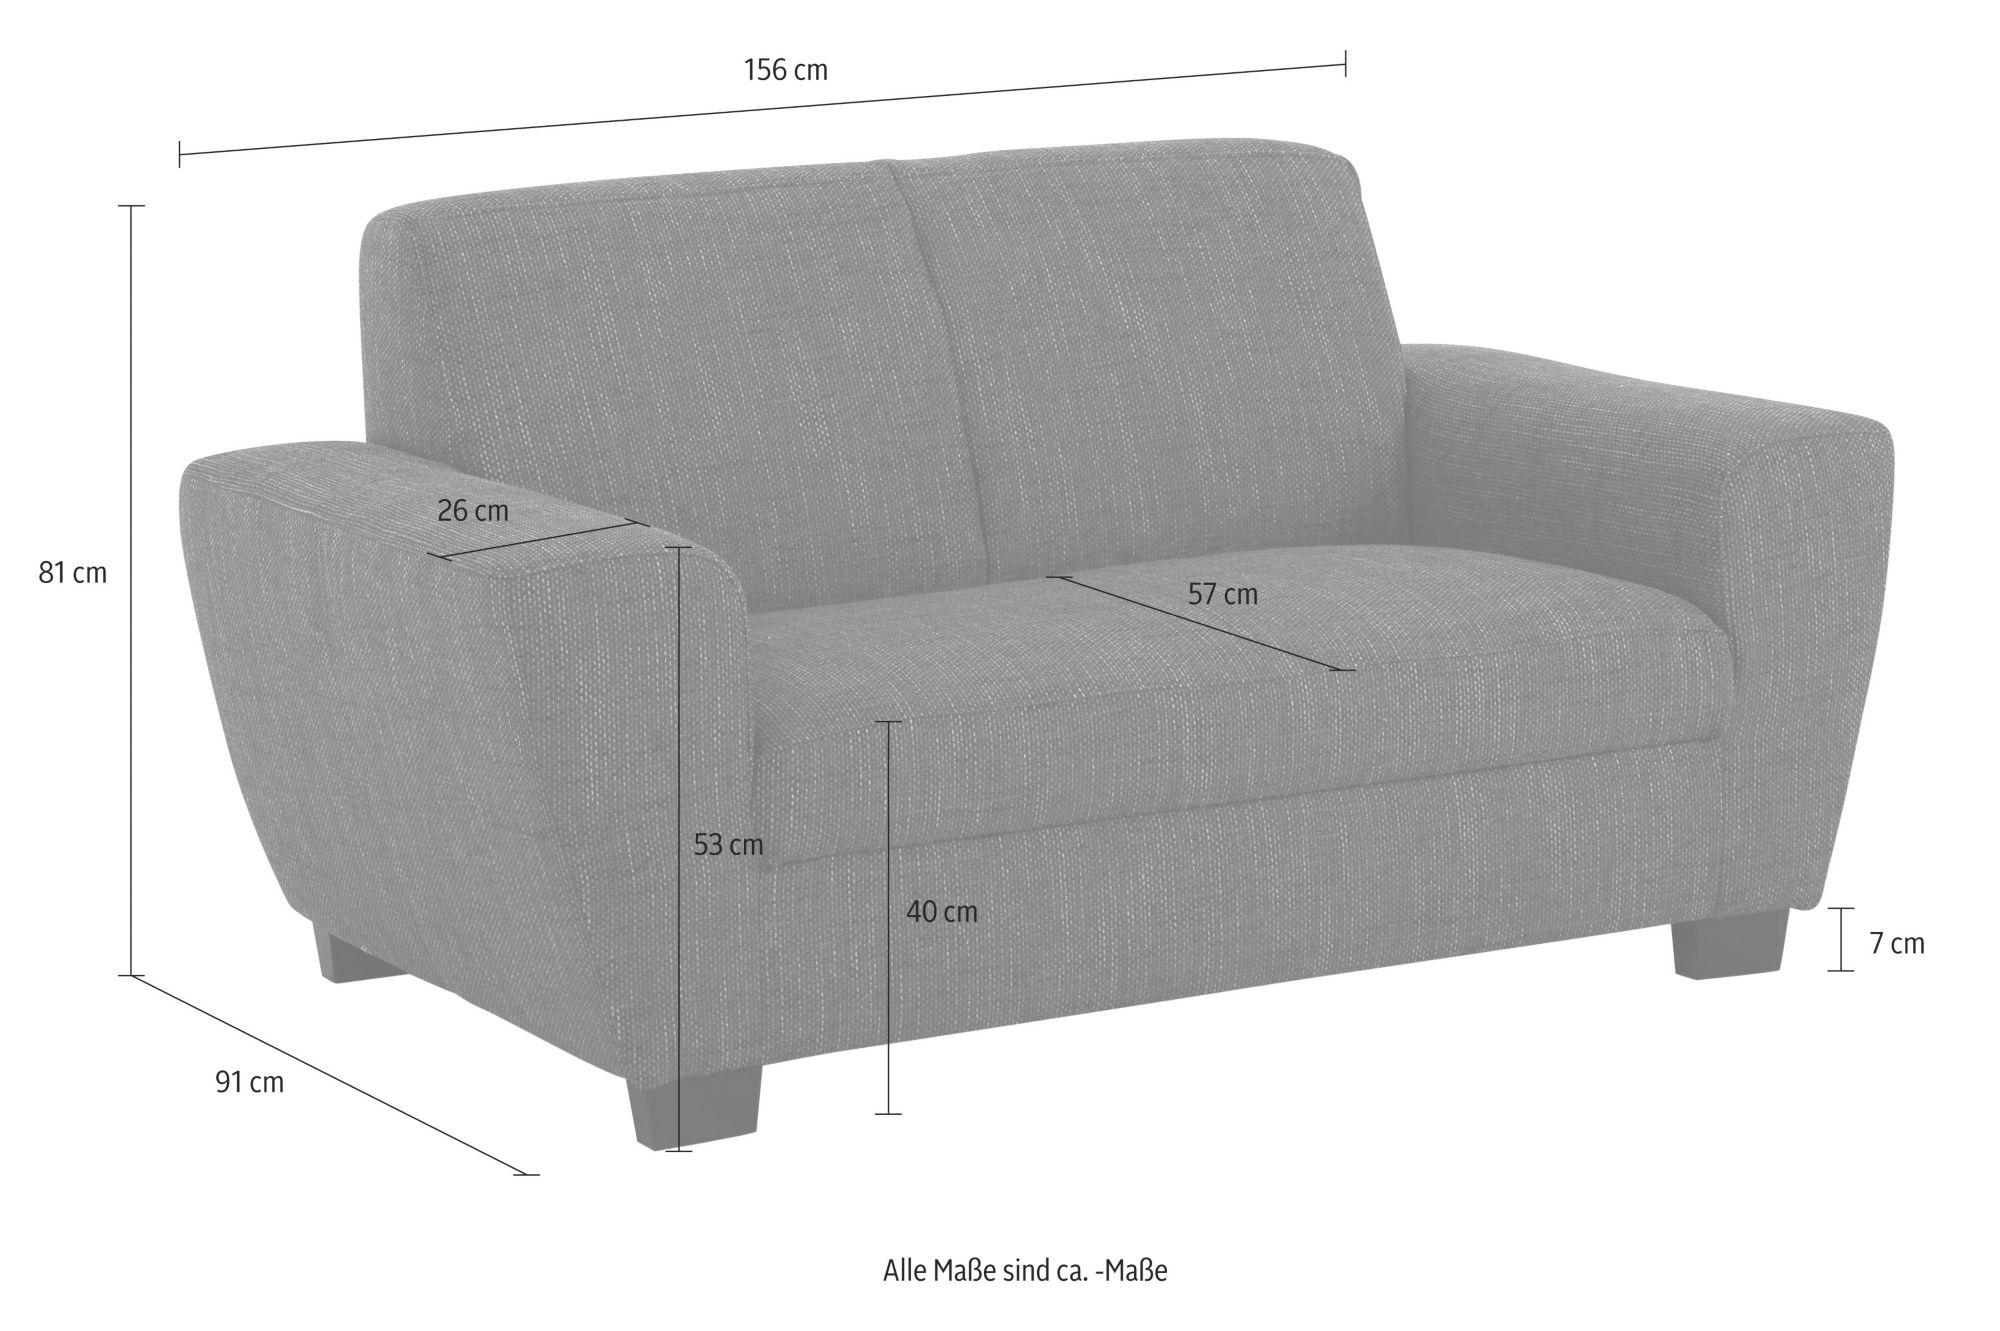 home affaire sofa ranger mit federkern schwab versand polsterm bel. Black Bedroom Furniture Sets. Home Design Ideas